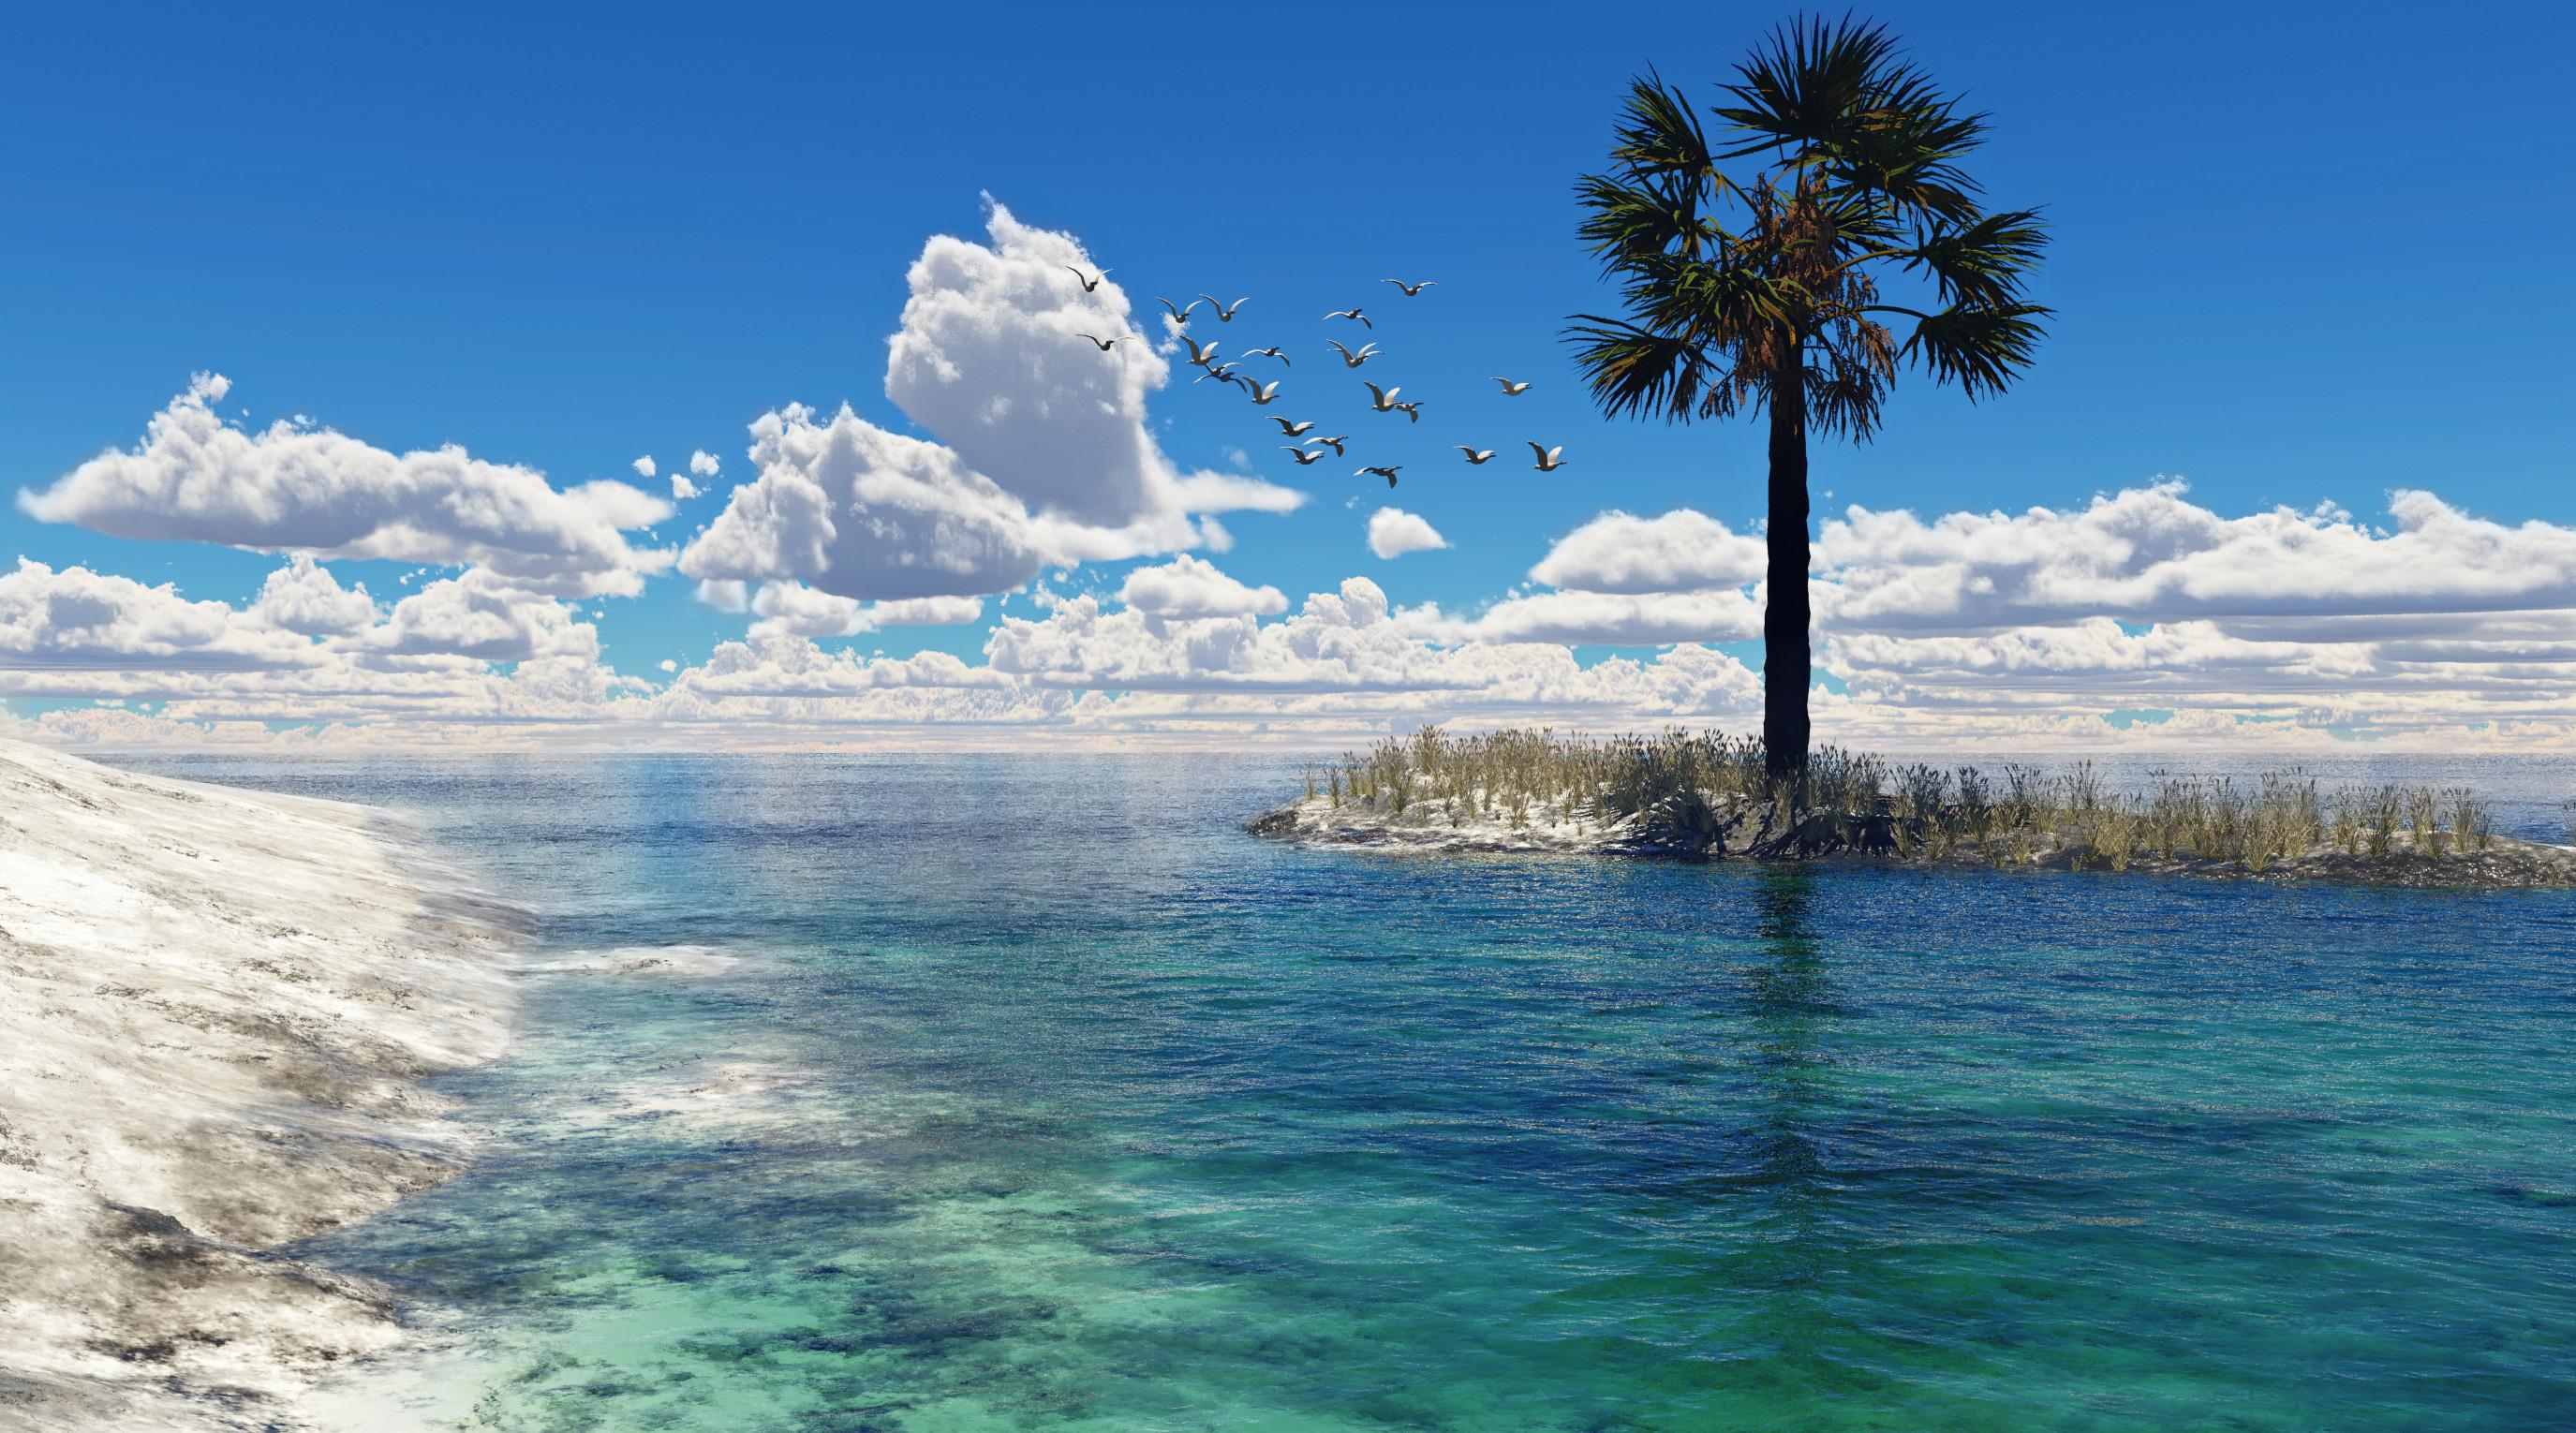 Earth   Seascape Wallpaper 2750x1530